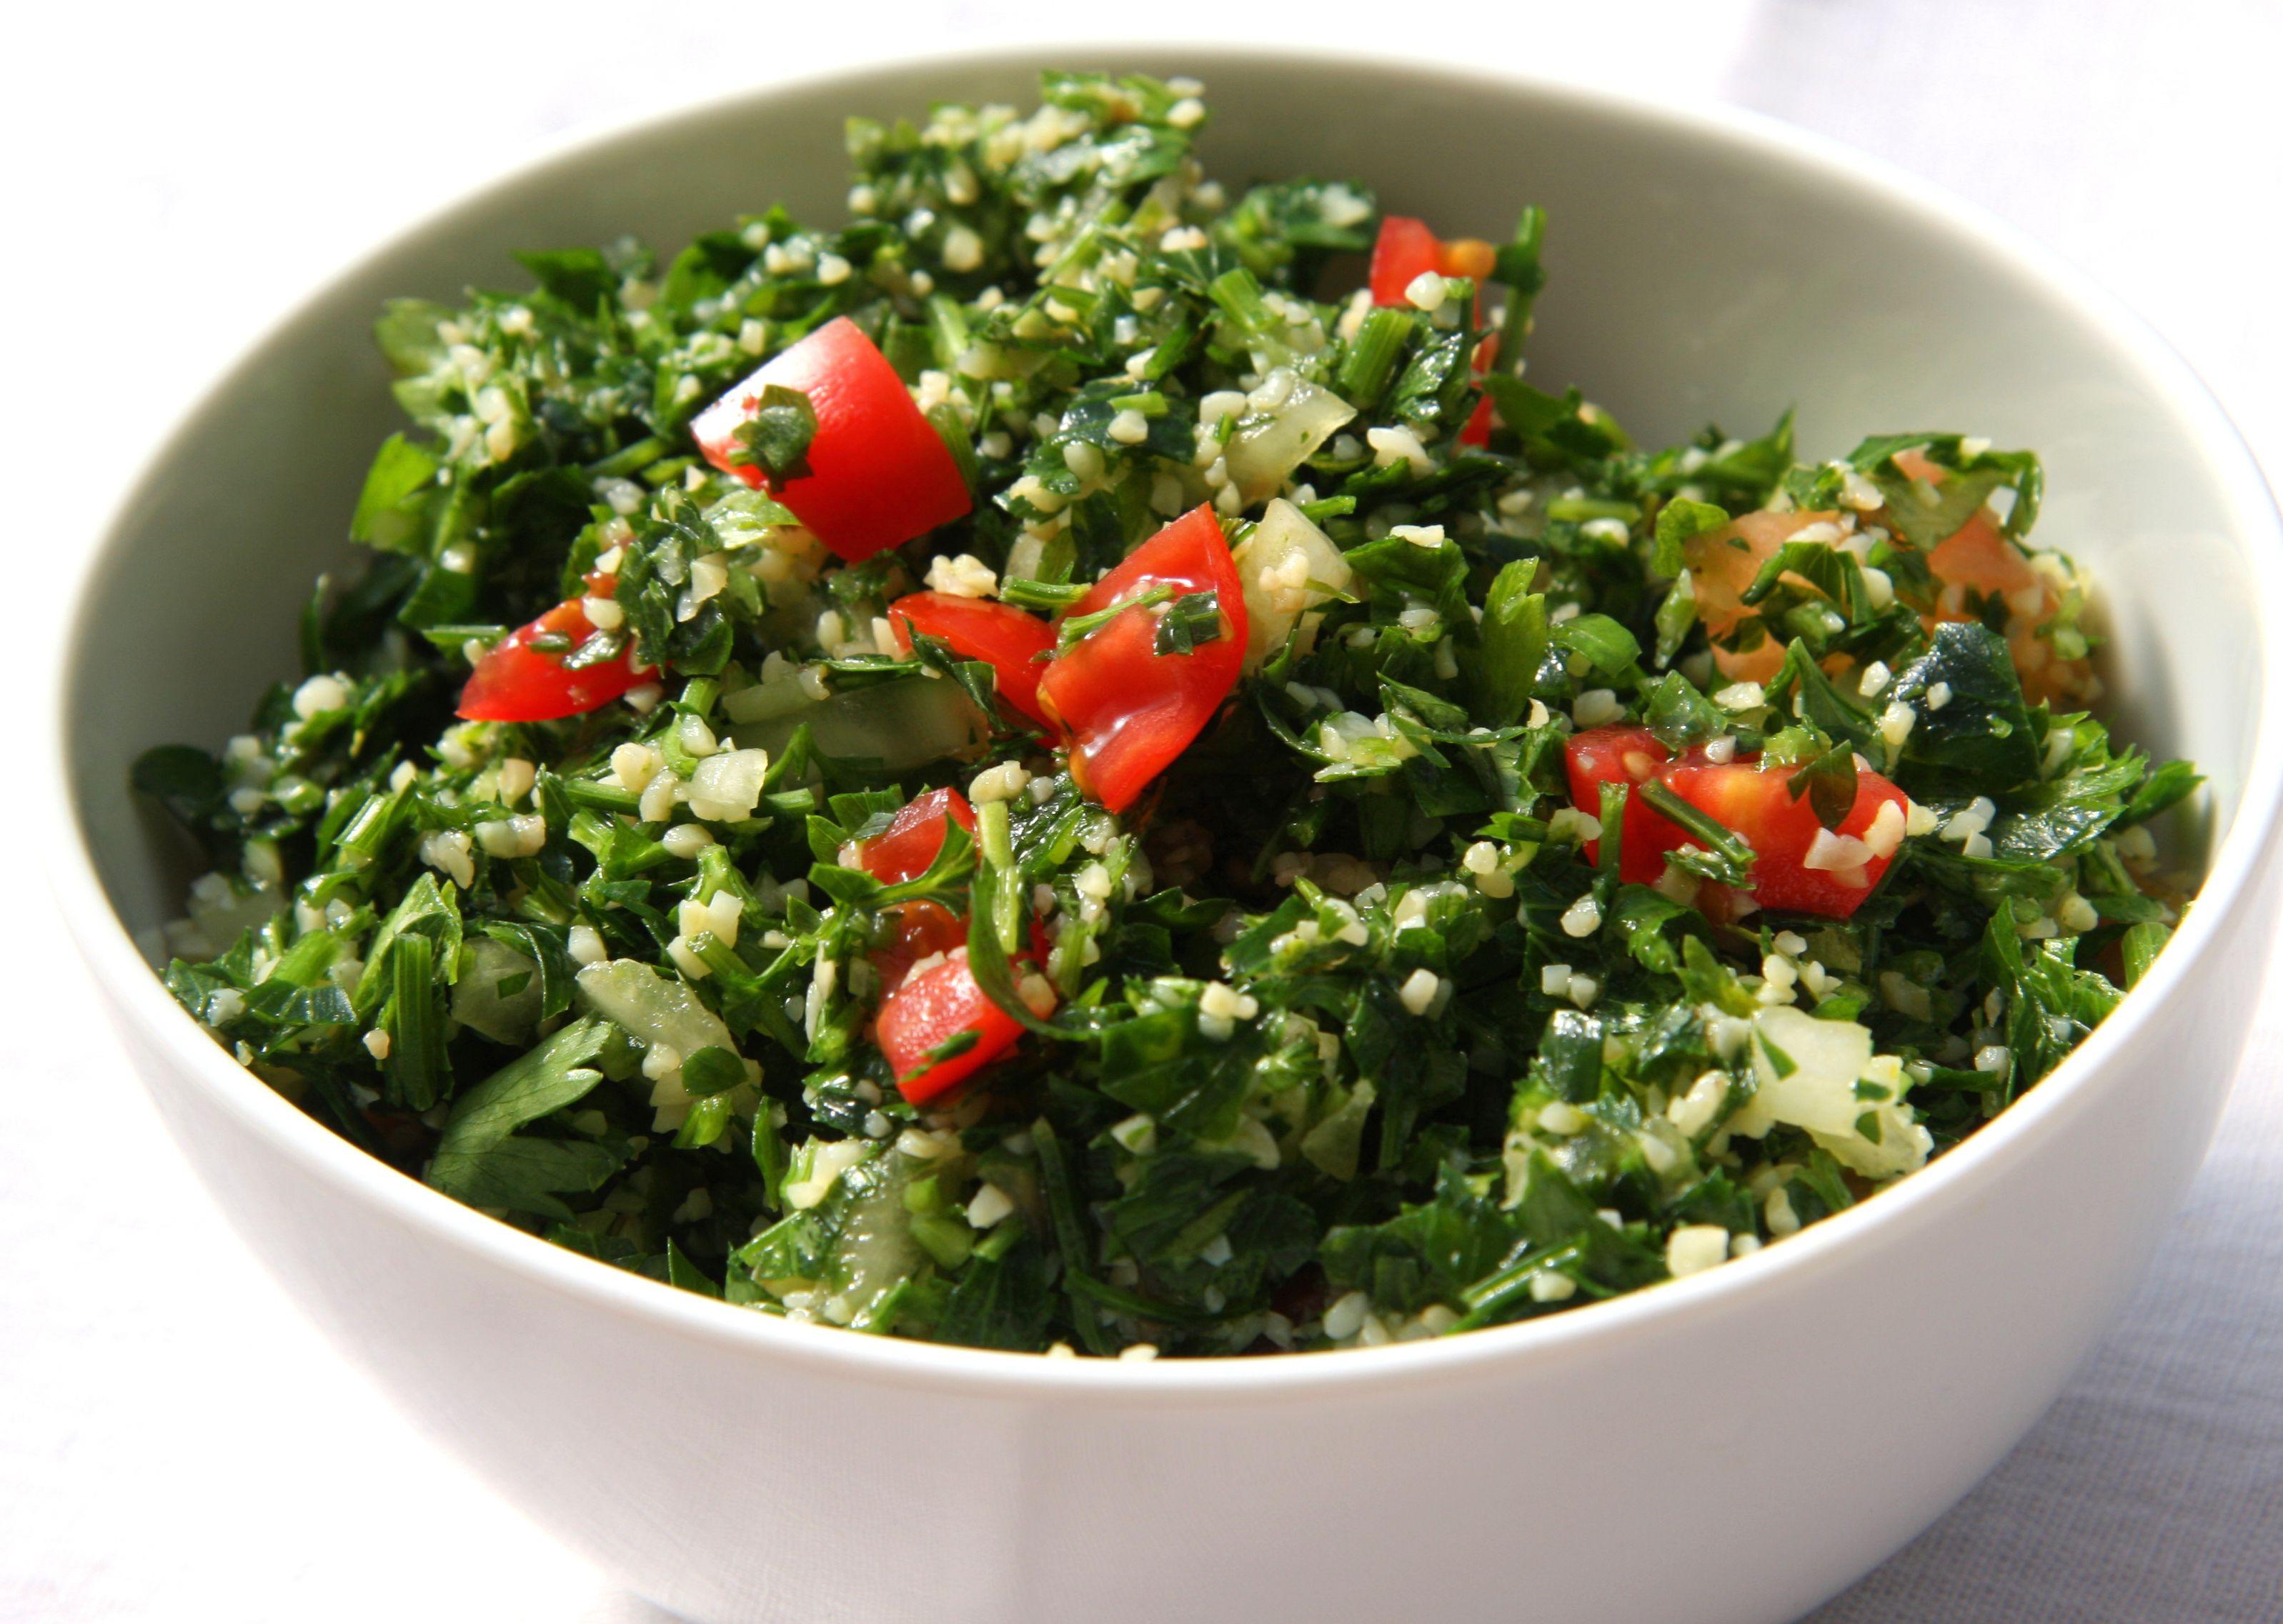 Classic Tabbouleh Salad Recipe (Tabouli)